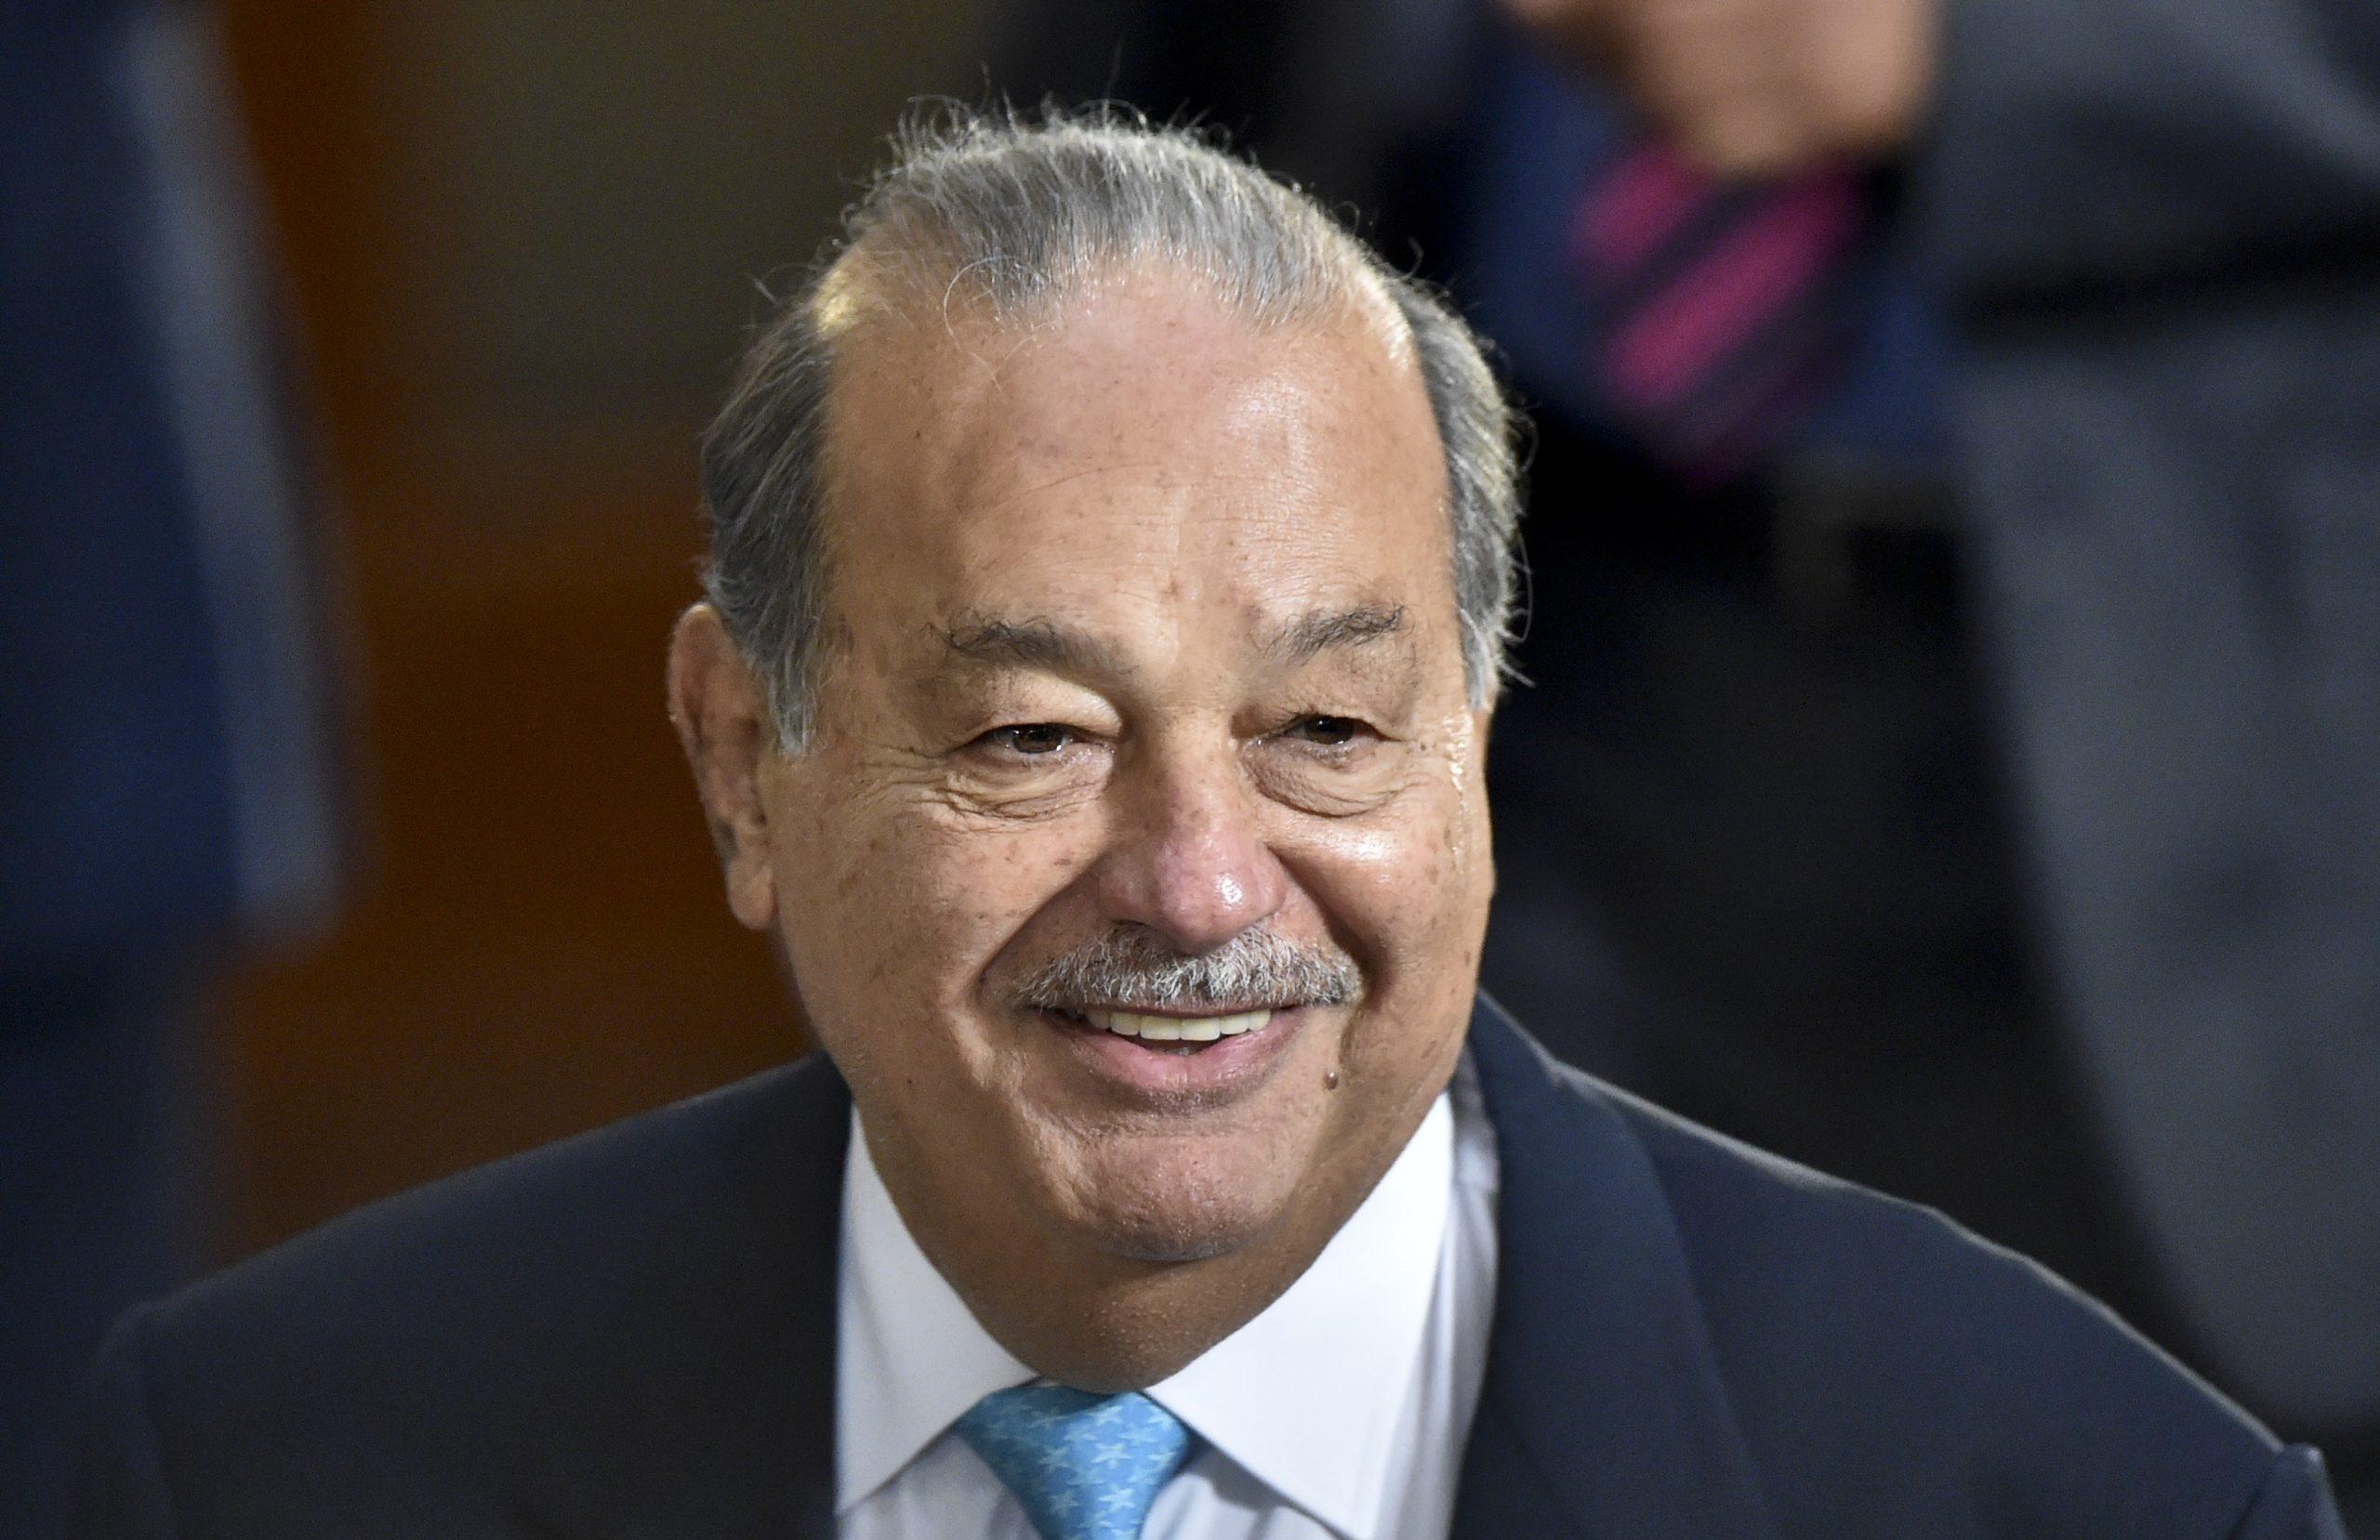 Carlos Slim Helu - Richest People in the World